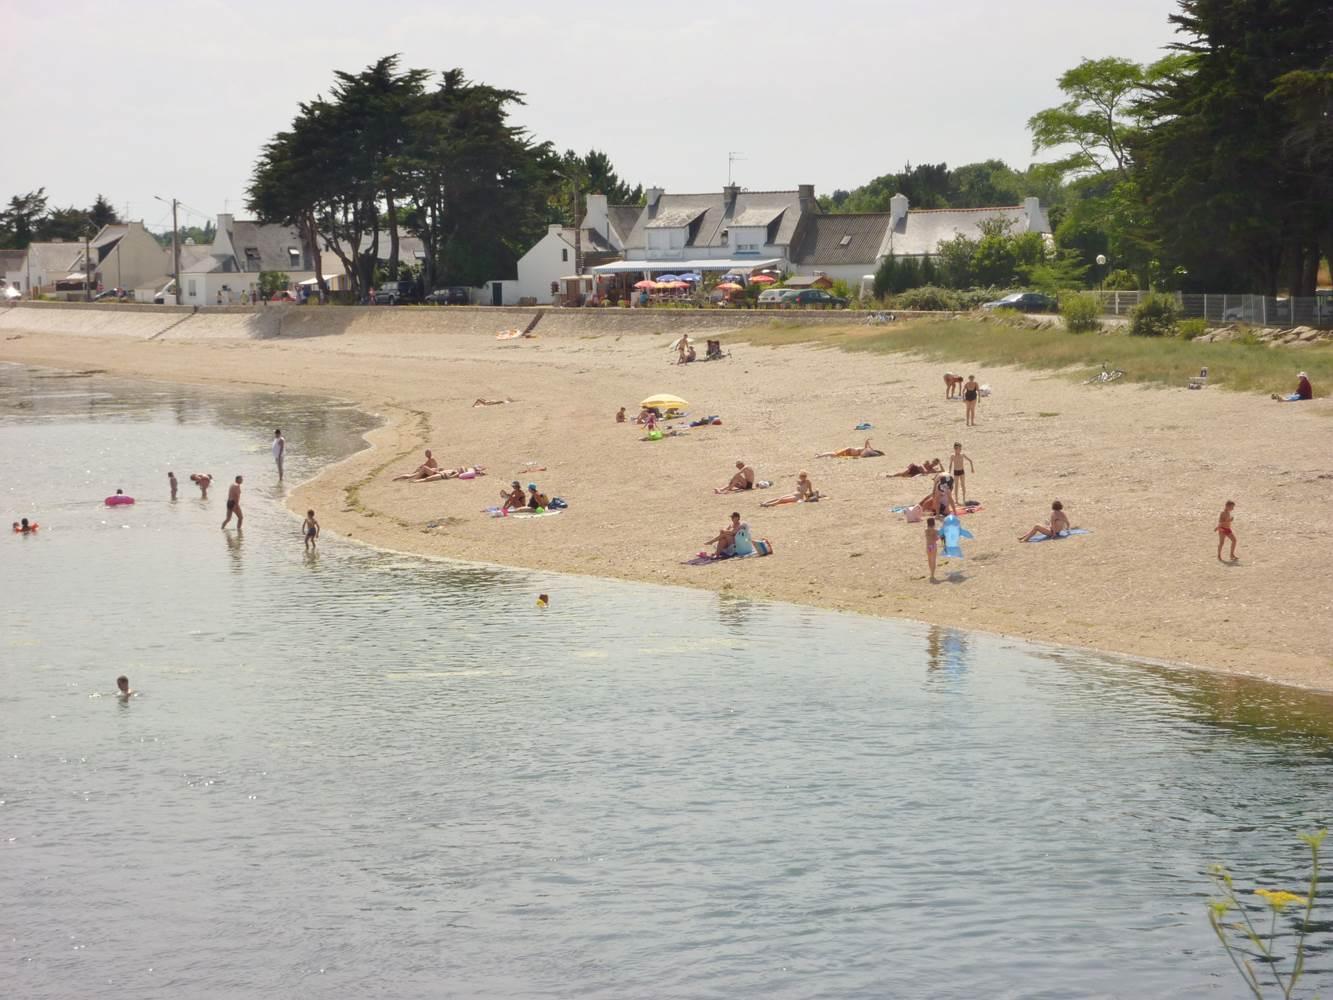 Plage-de-Banastère-Sarzeau-morbihan-bretagne sud ©